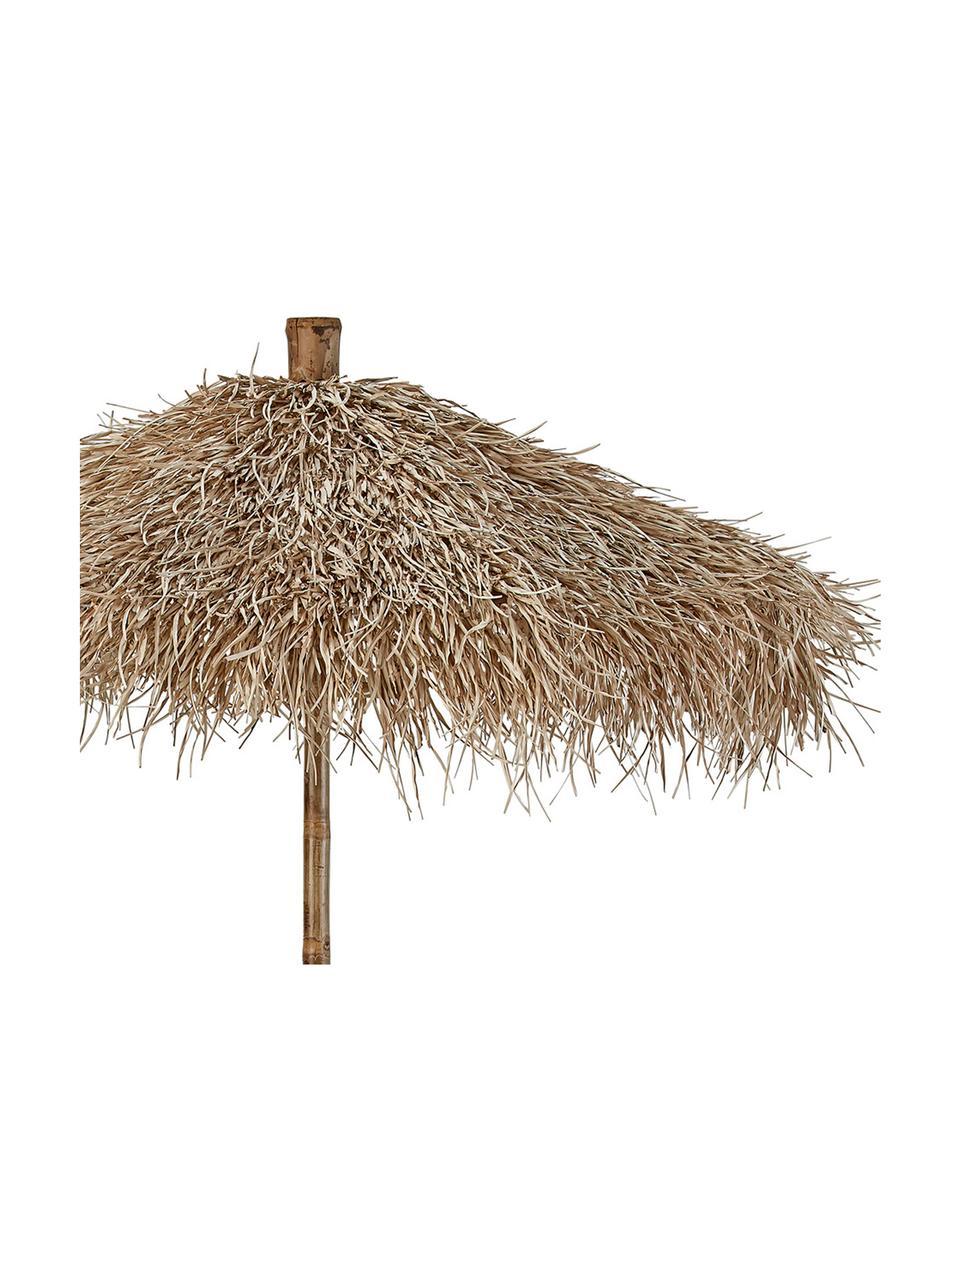 Ombrello decorativo  in bambù Mandisa, Ø 150 cm, Bambù, finitura naturale, Bambù, Ø 150 x Alt. 240 cm